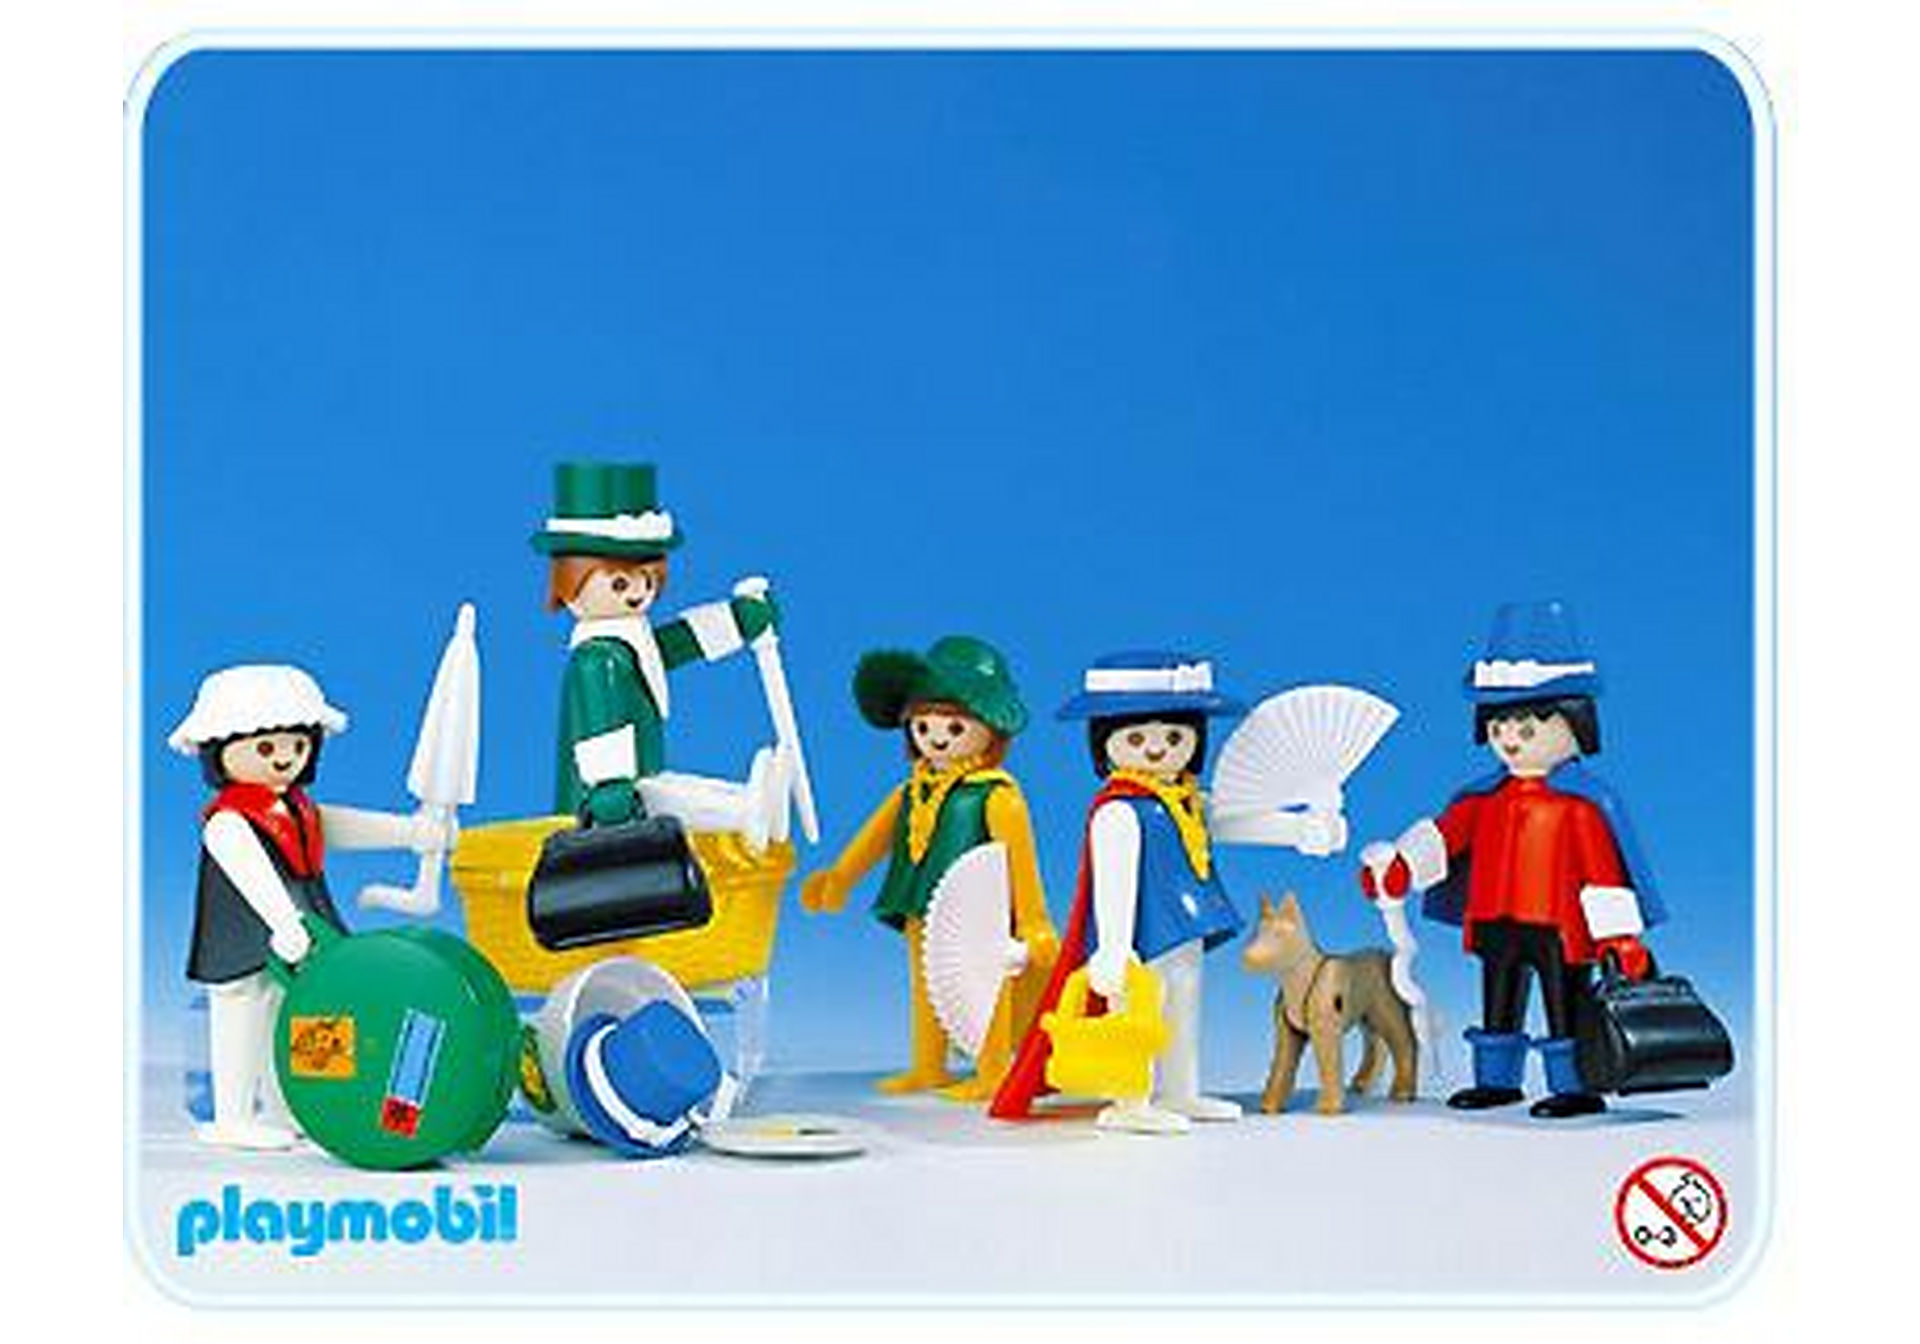 http://media.playmobil.com/i/playmobil/3543-A_product_detail/Aristokraten